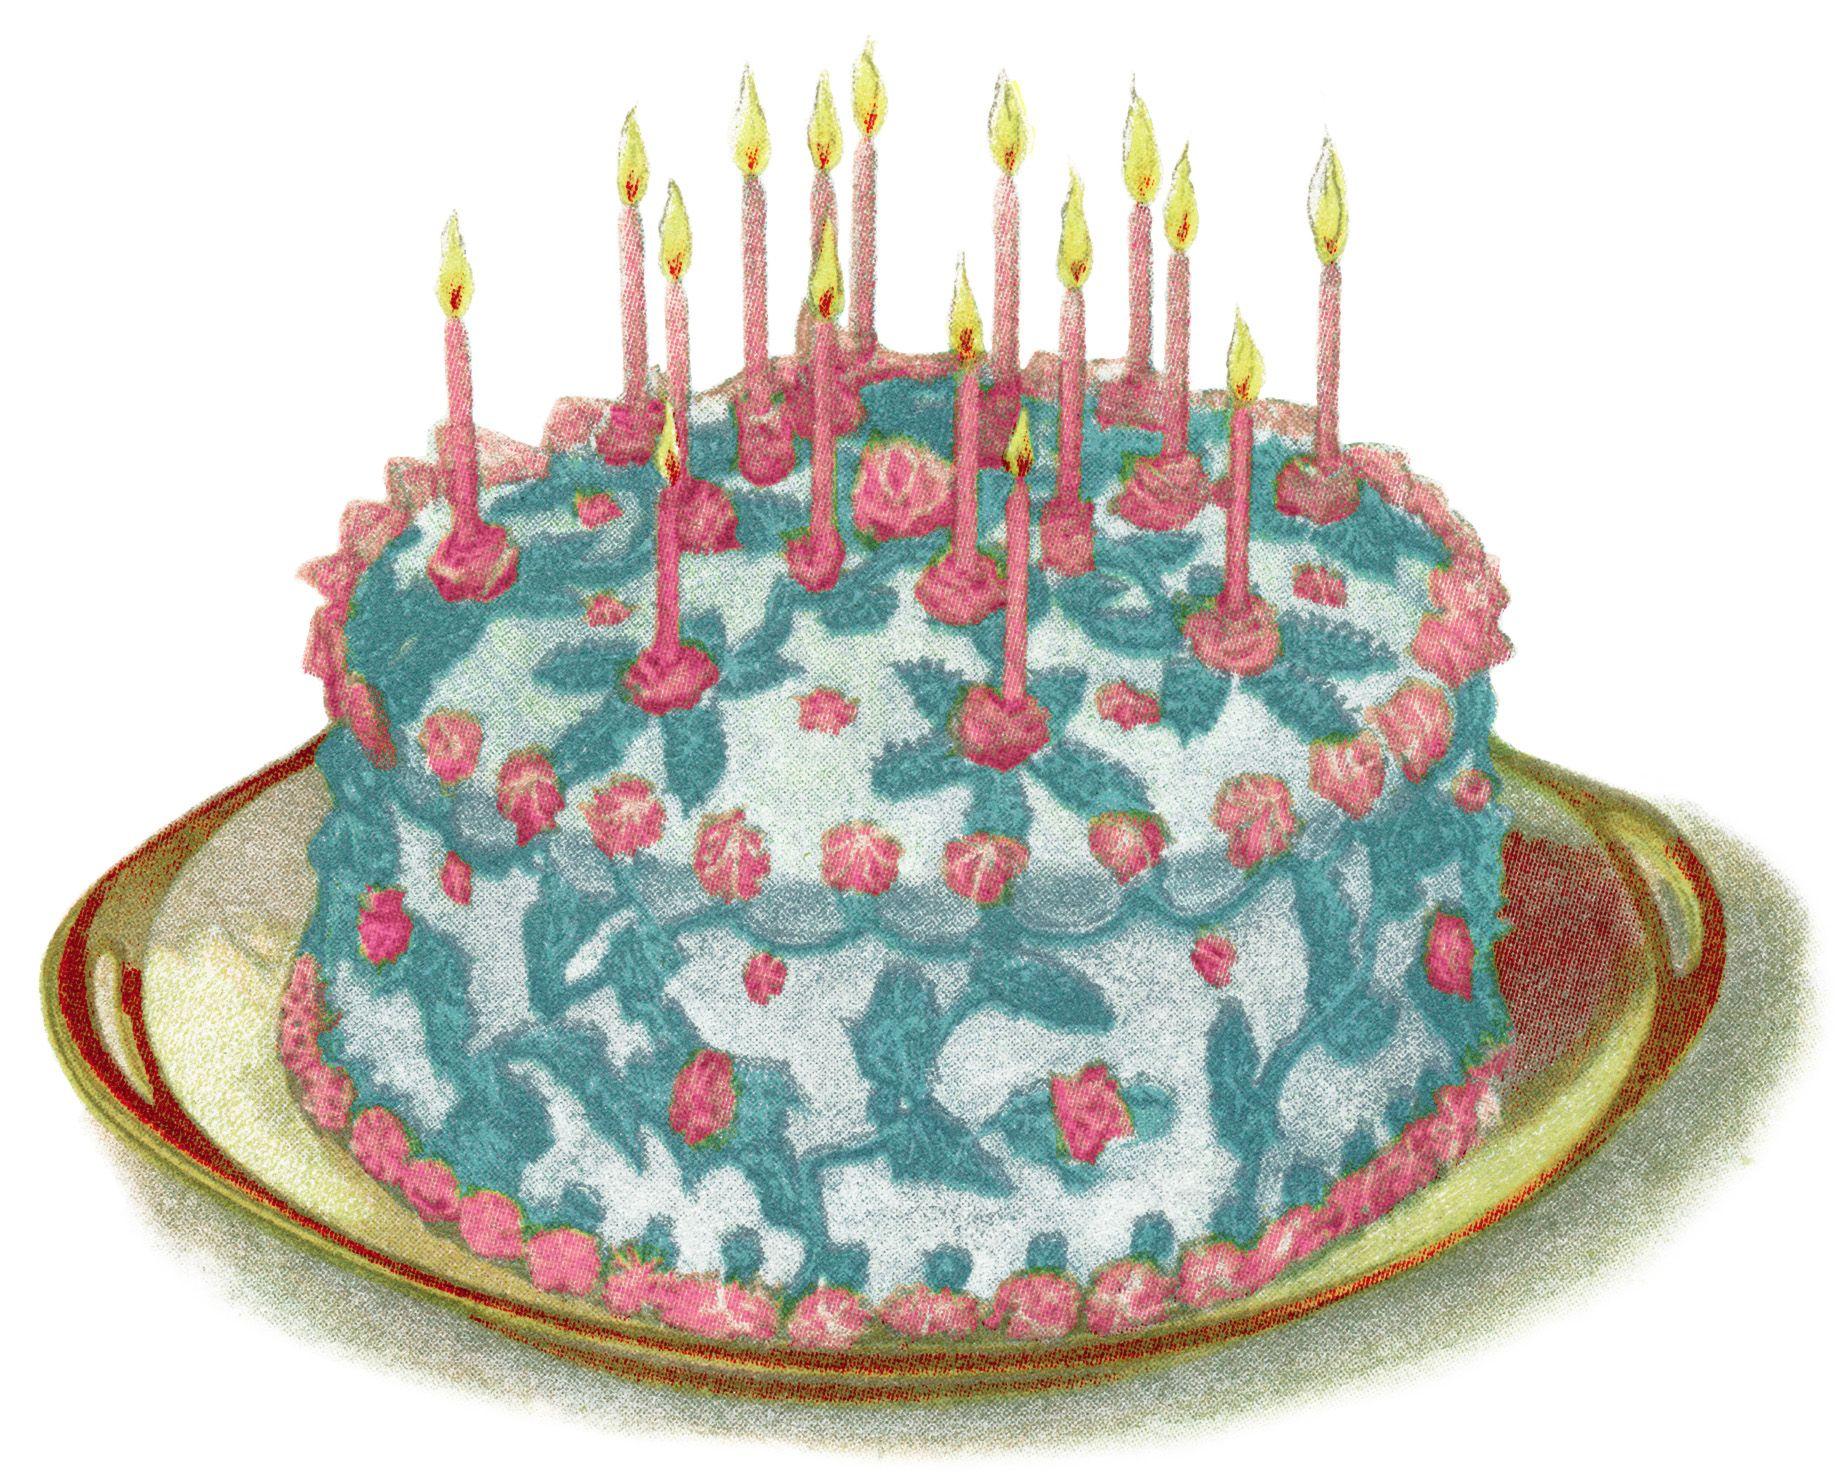 vintage cake clip art, birthday cake illustration, vintage.